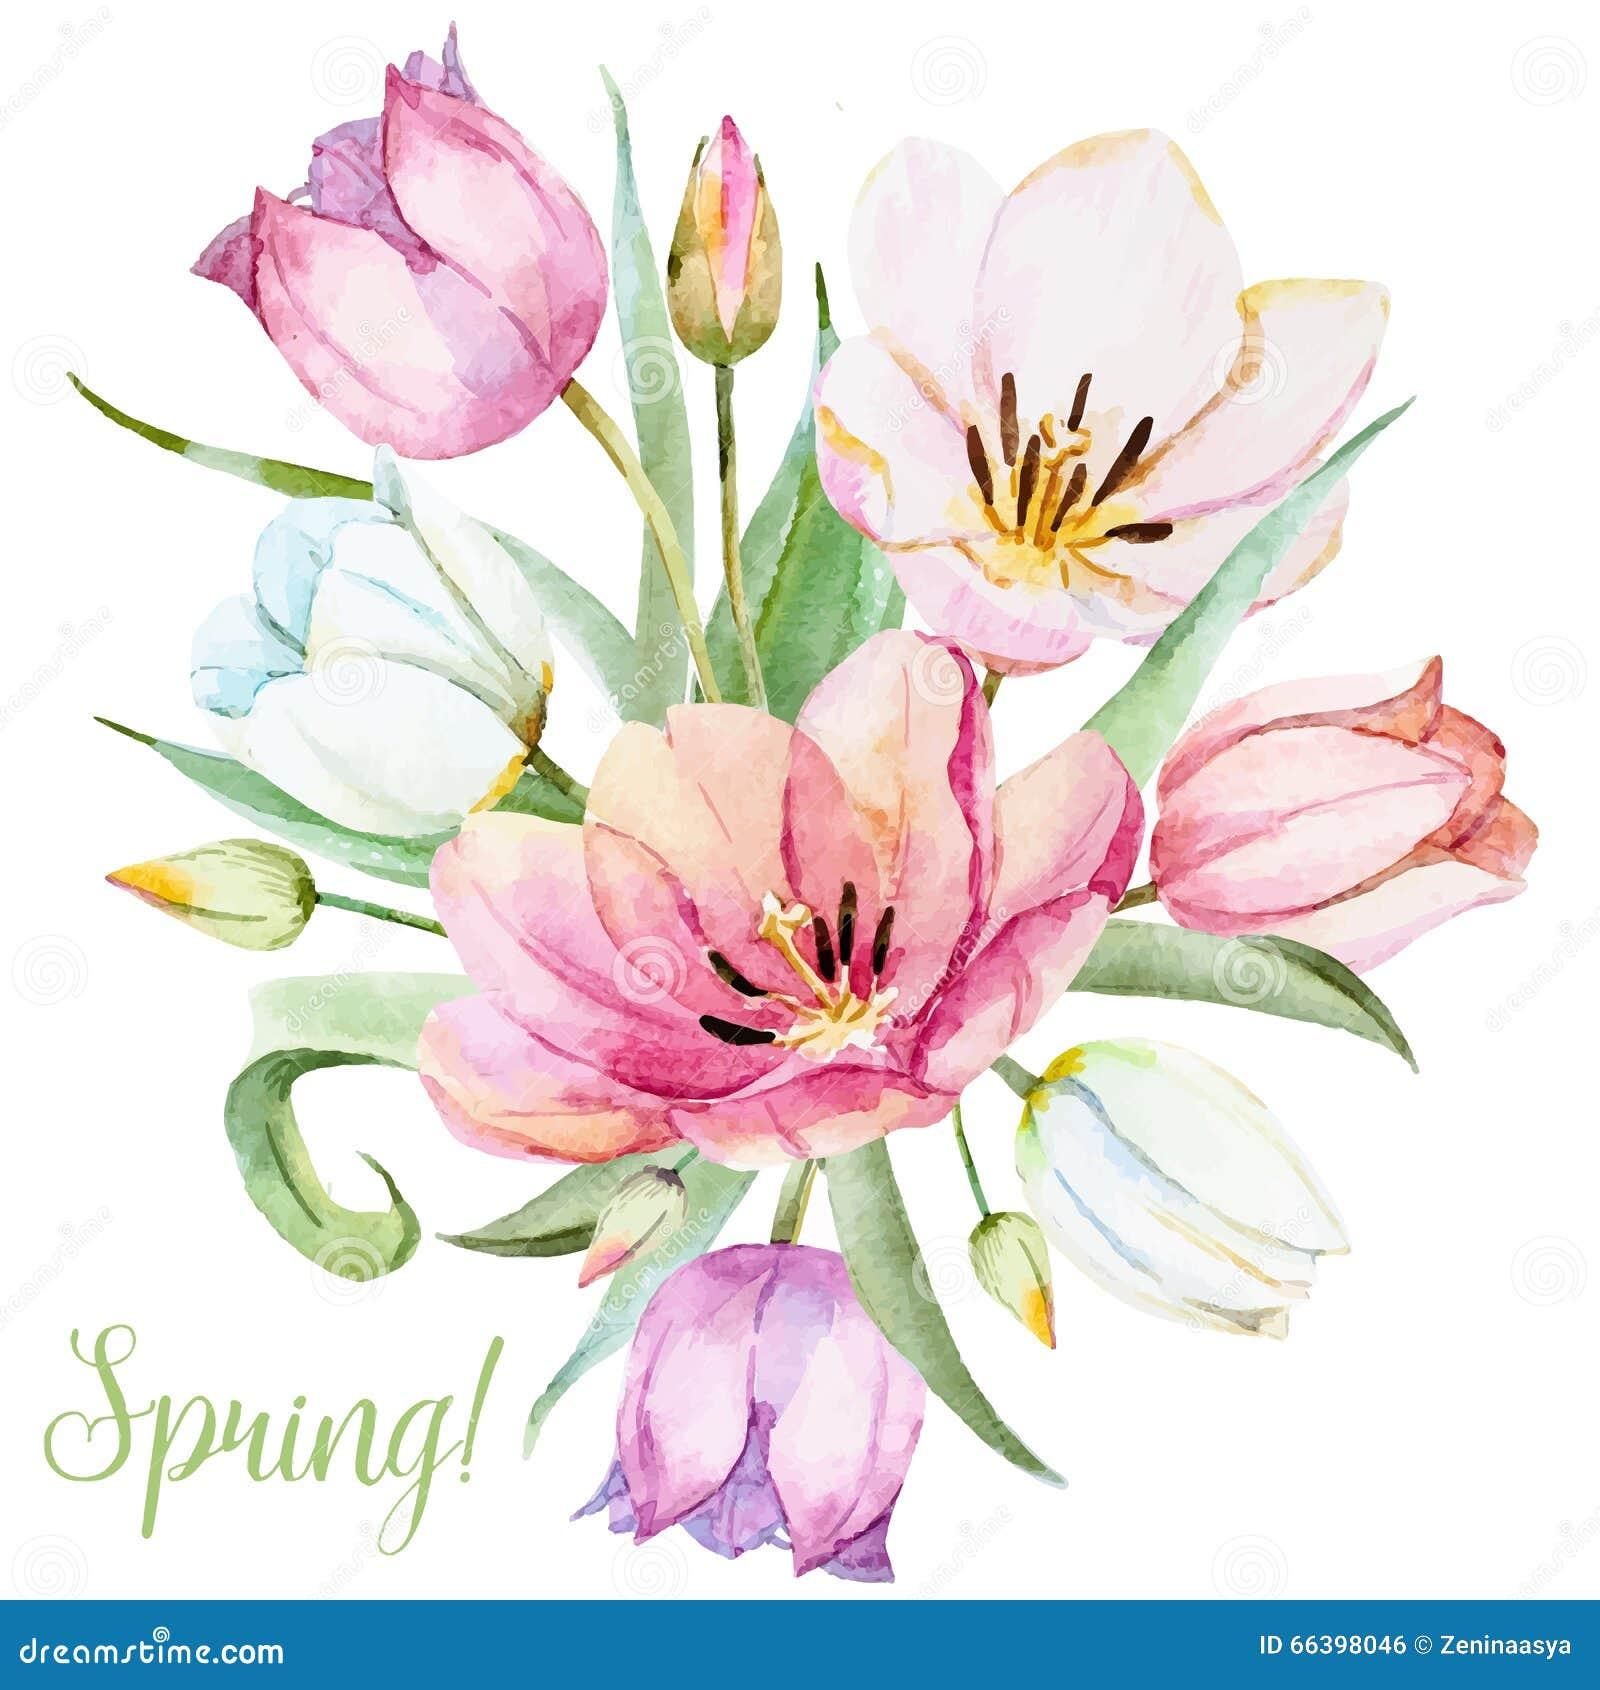 Watercolor vector spring flowers stock vector image for Spring flowers watercolor